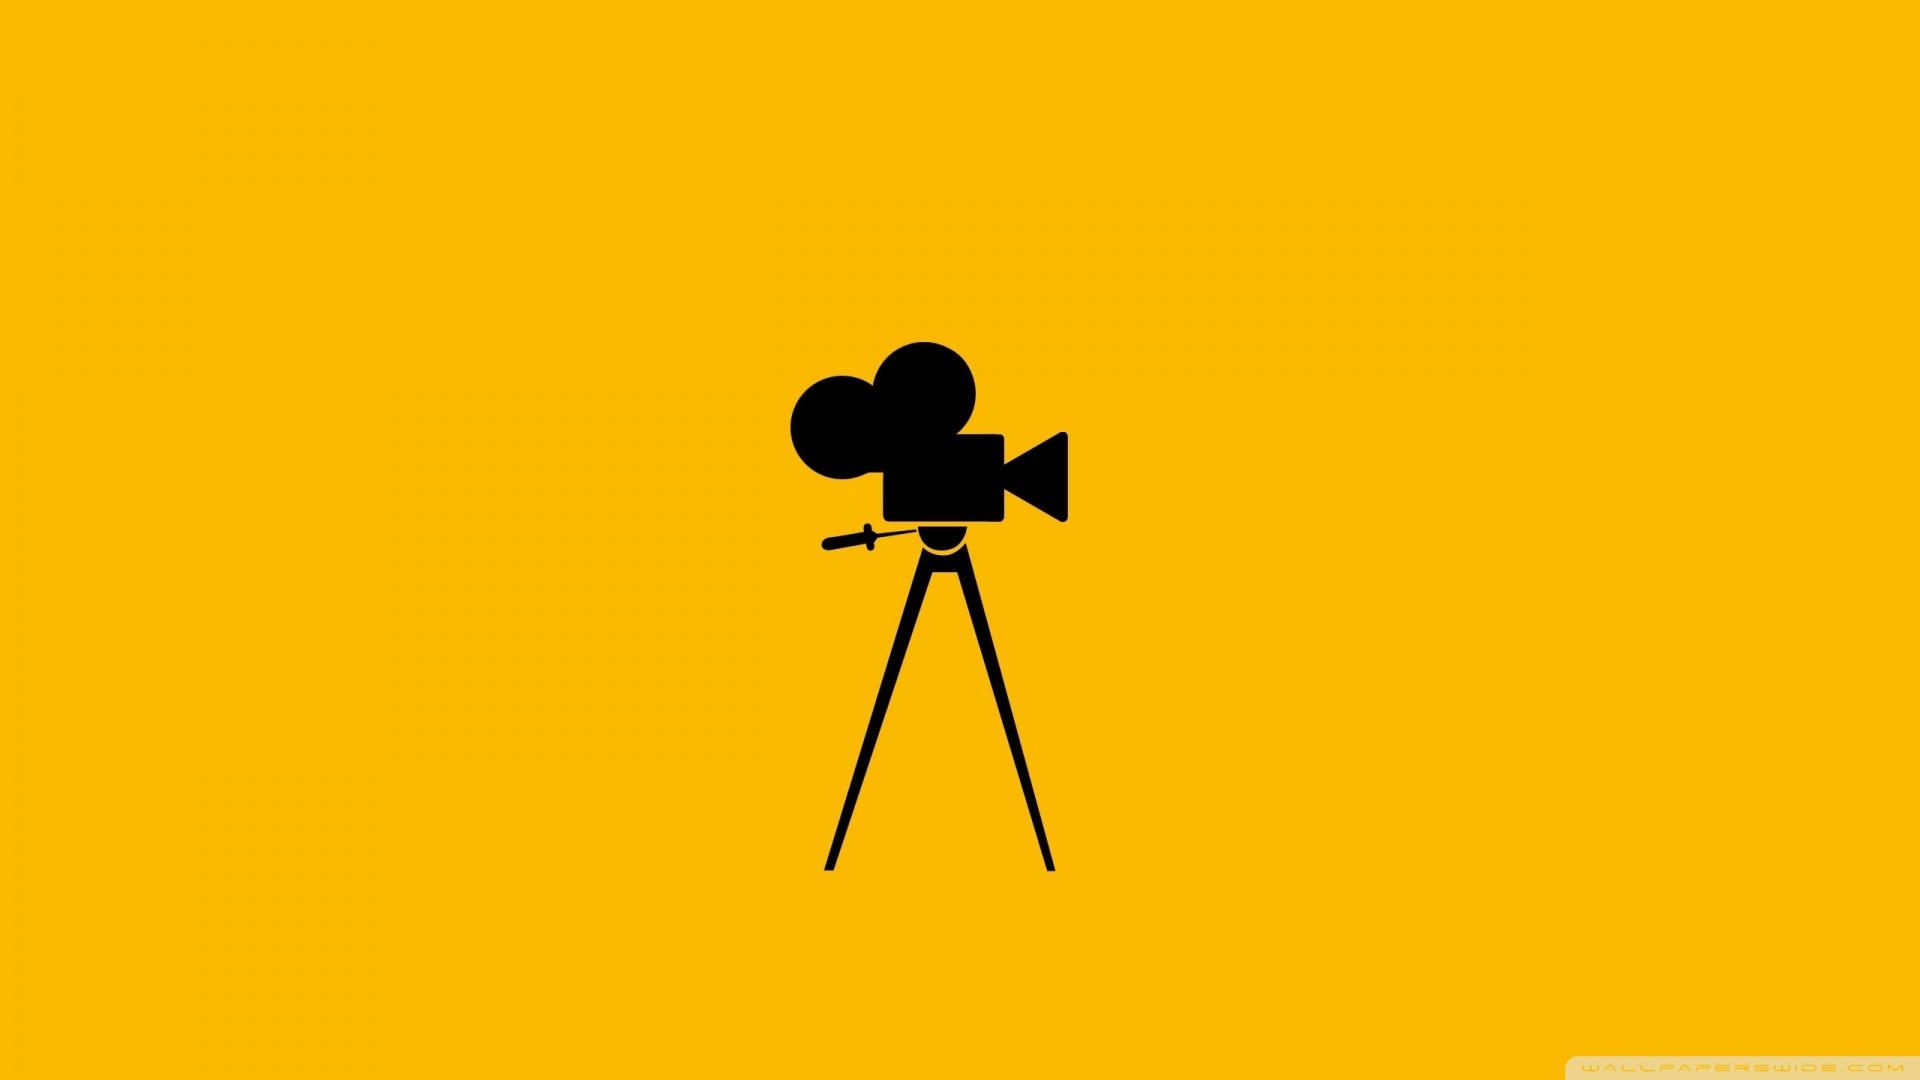 76 Filmmaking Wallpaper On Wallpapersafari